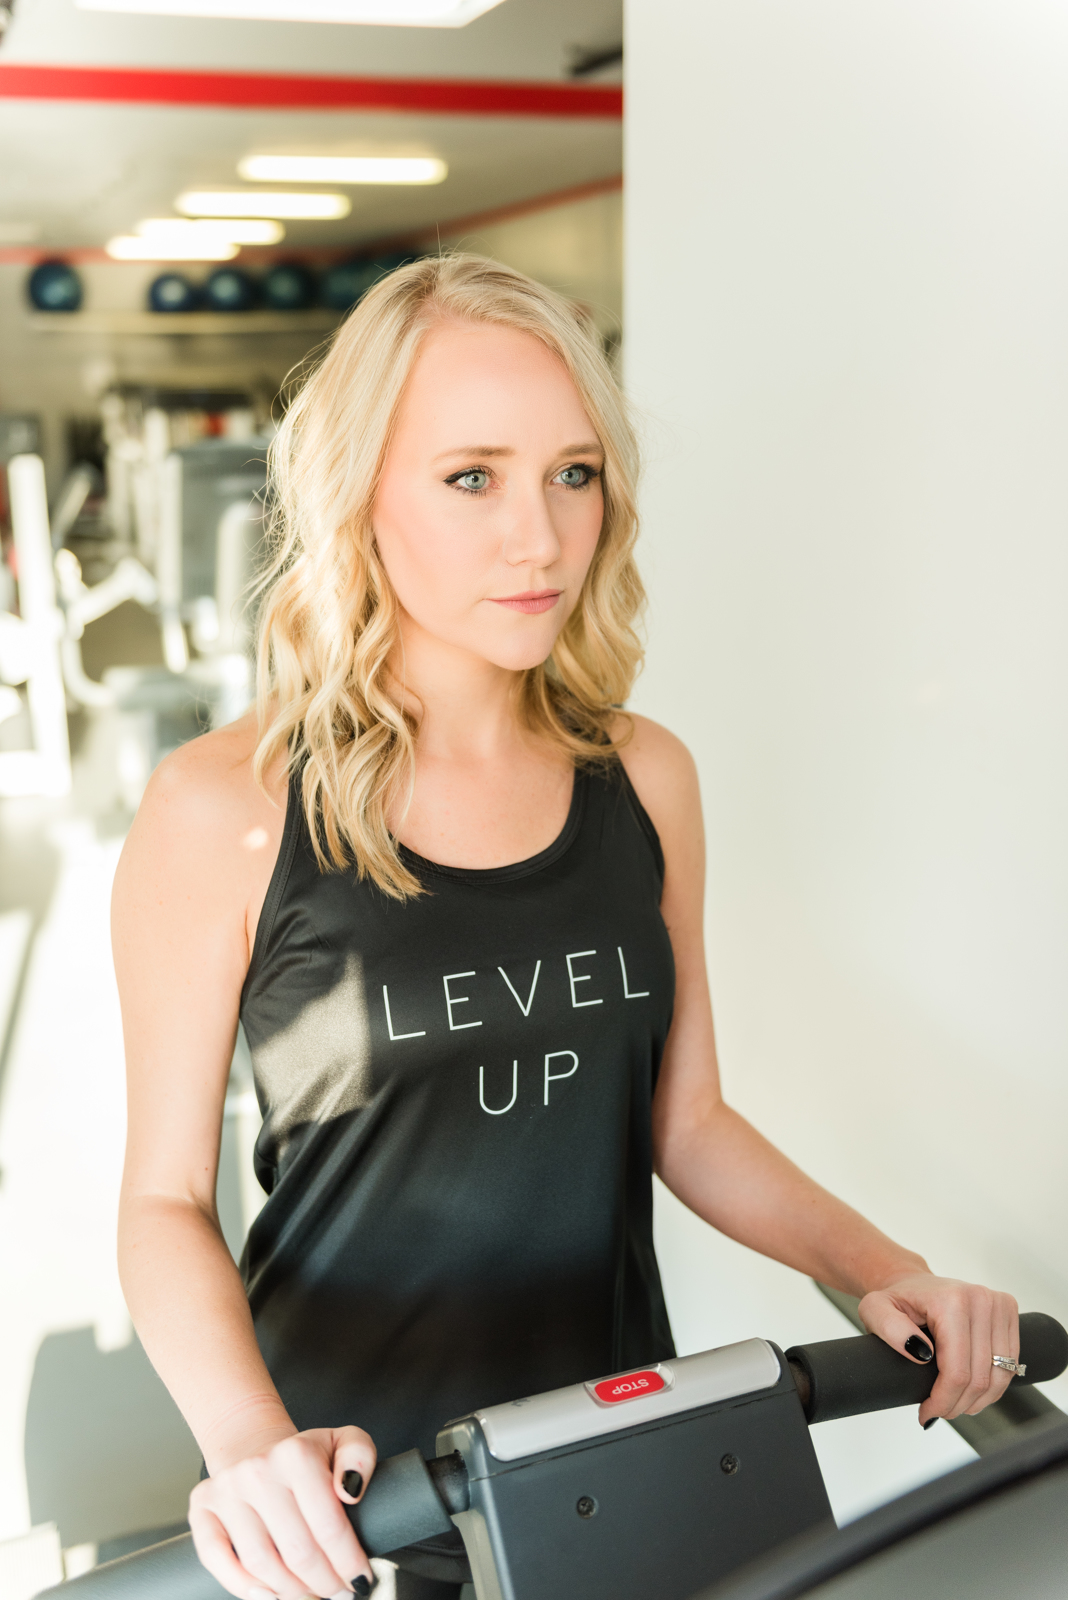 woman in black tank standing on treadmill